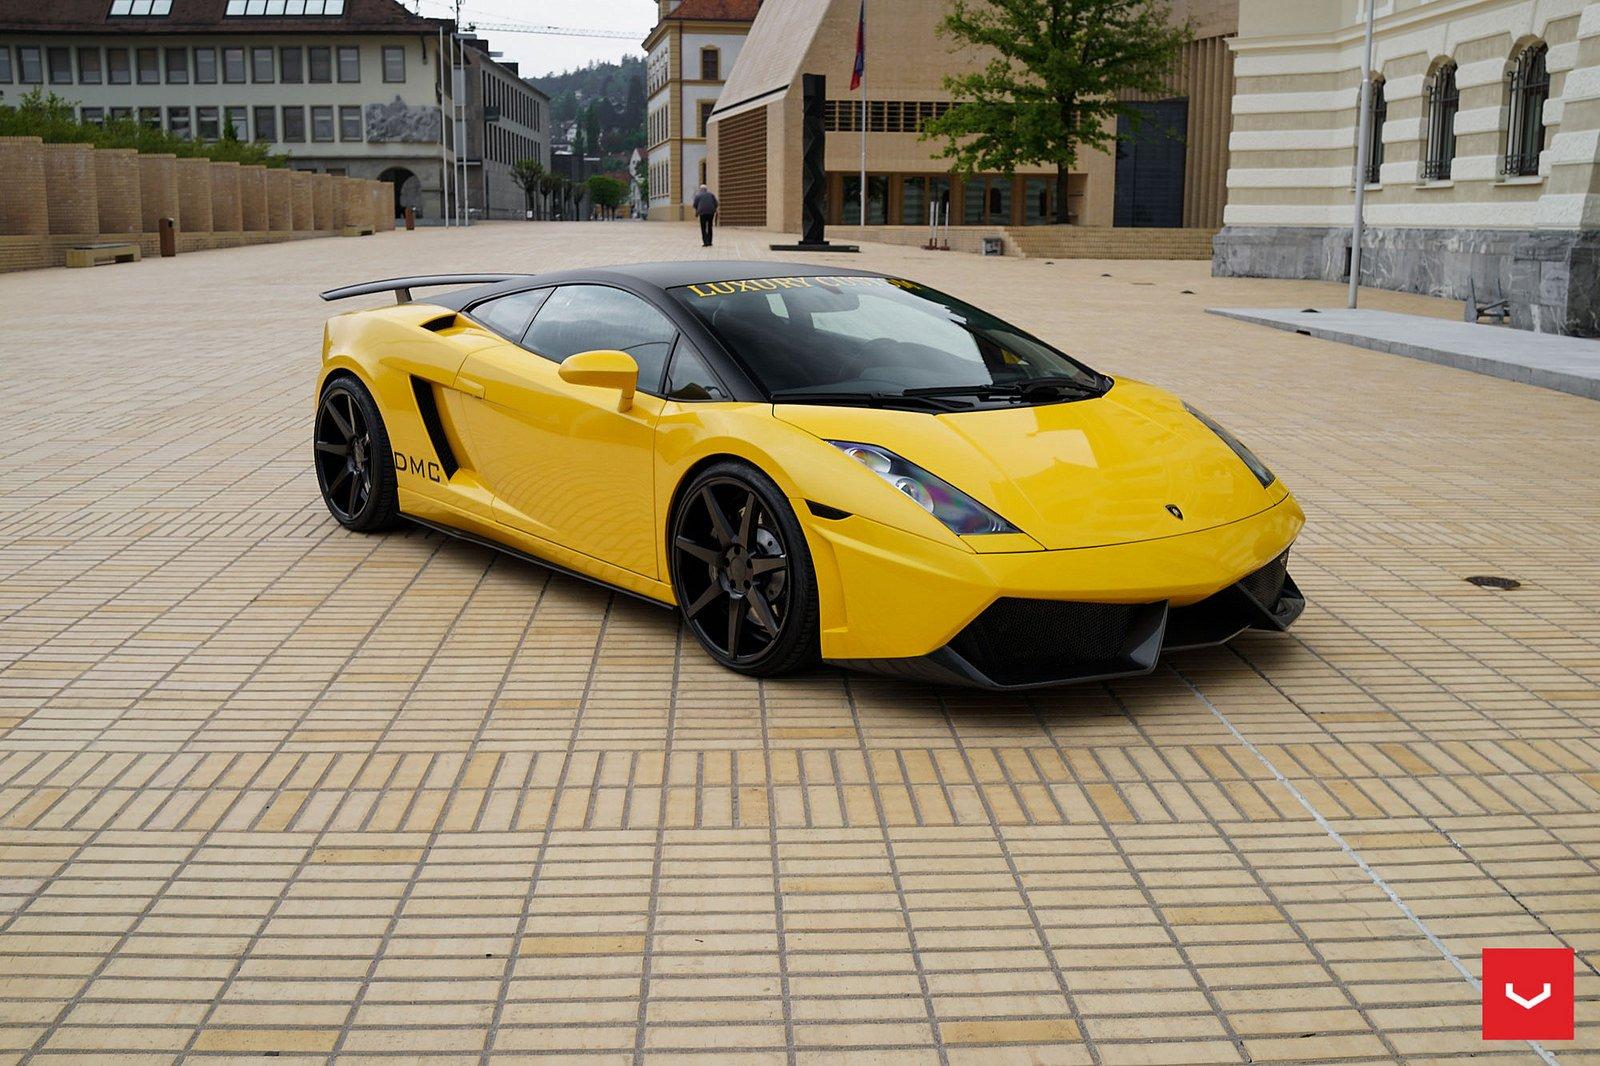 Lamborghini Gallardo yellow Vossen Wheels cars wallpaper ...